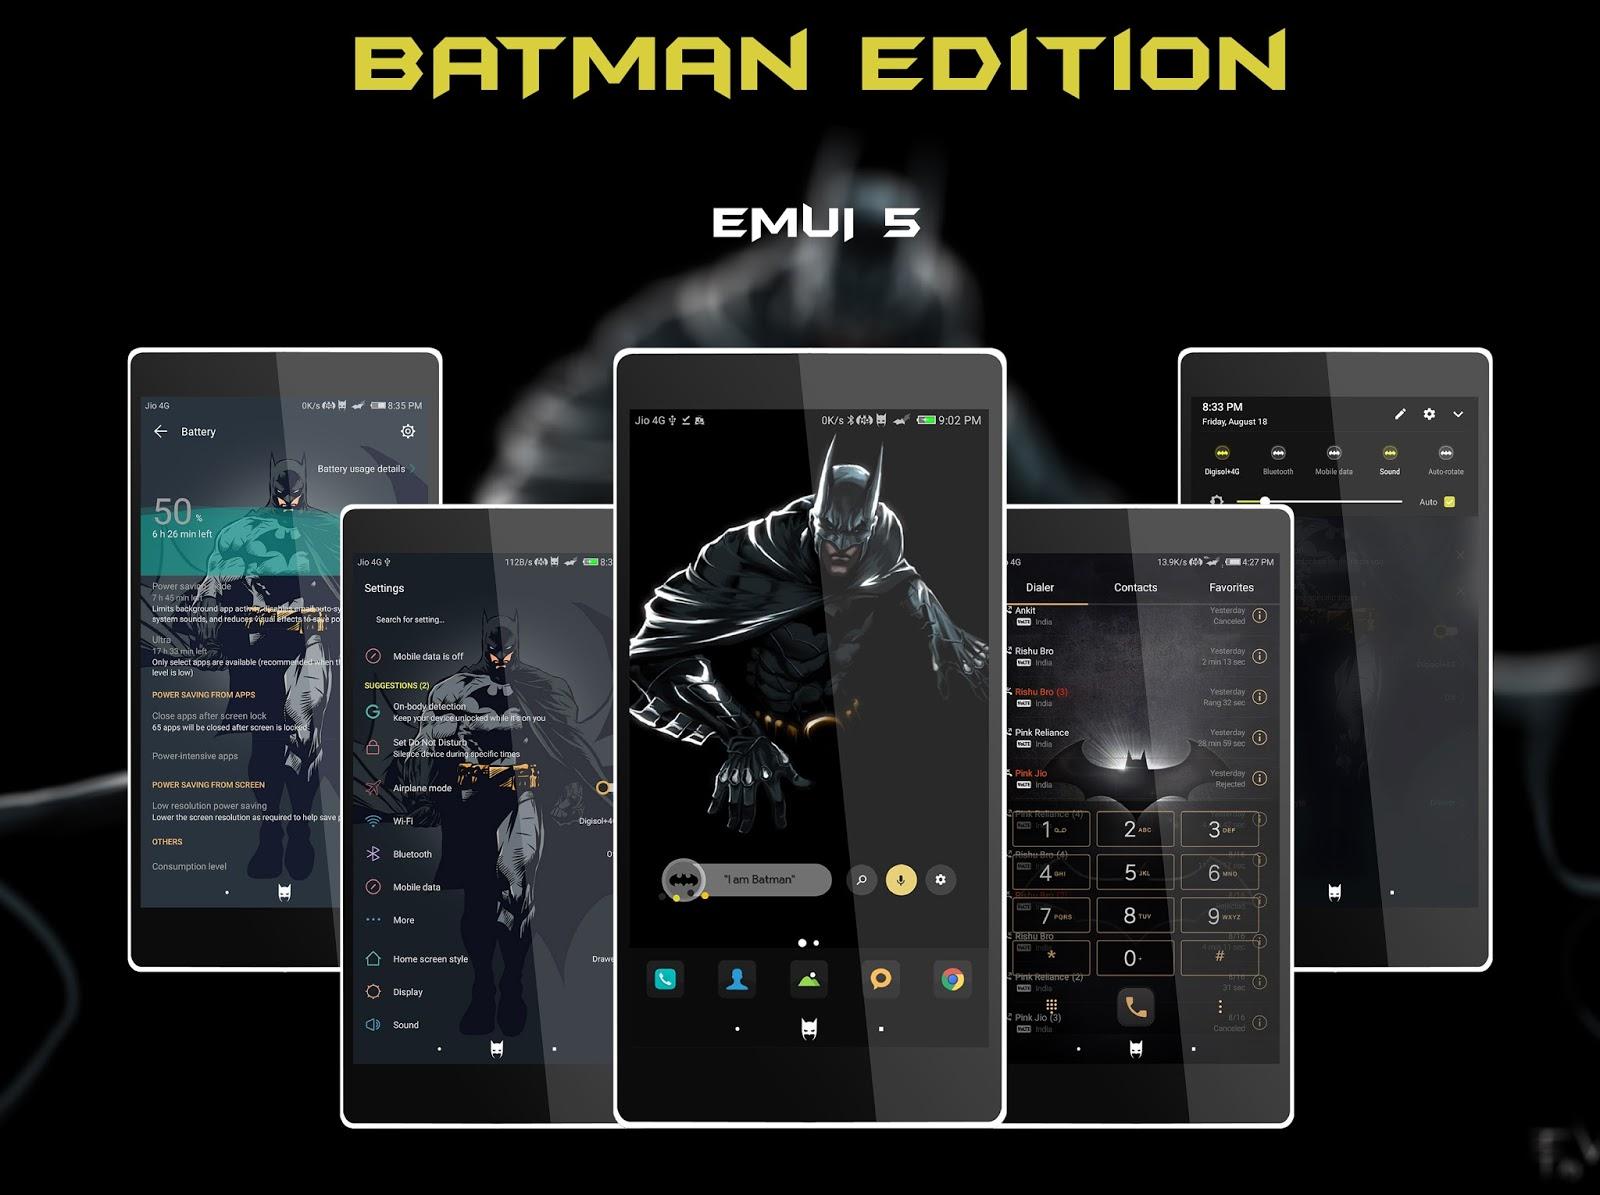 Injustice Edition || EMUI 5 THEME - Emui Themes